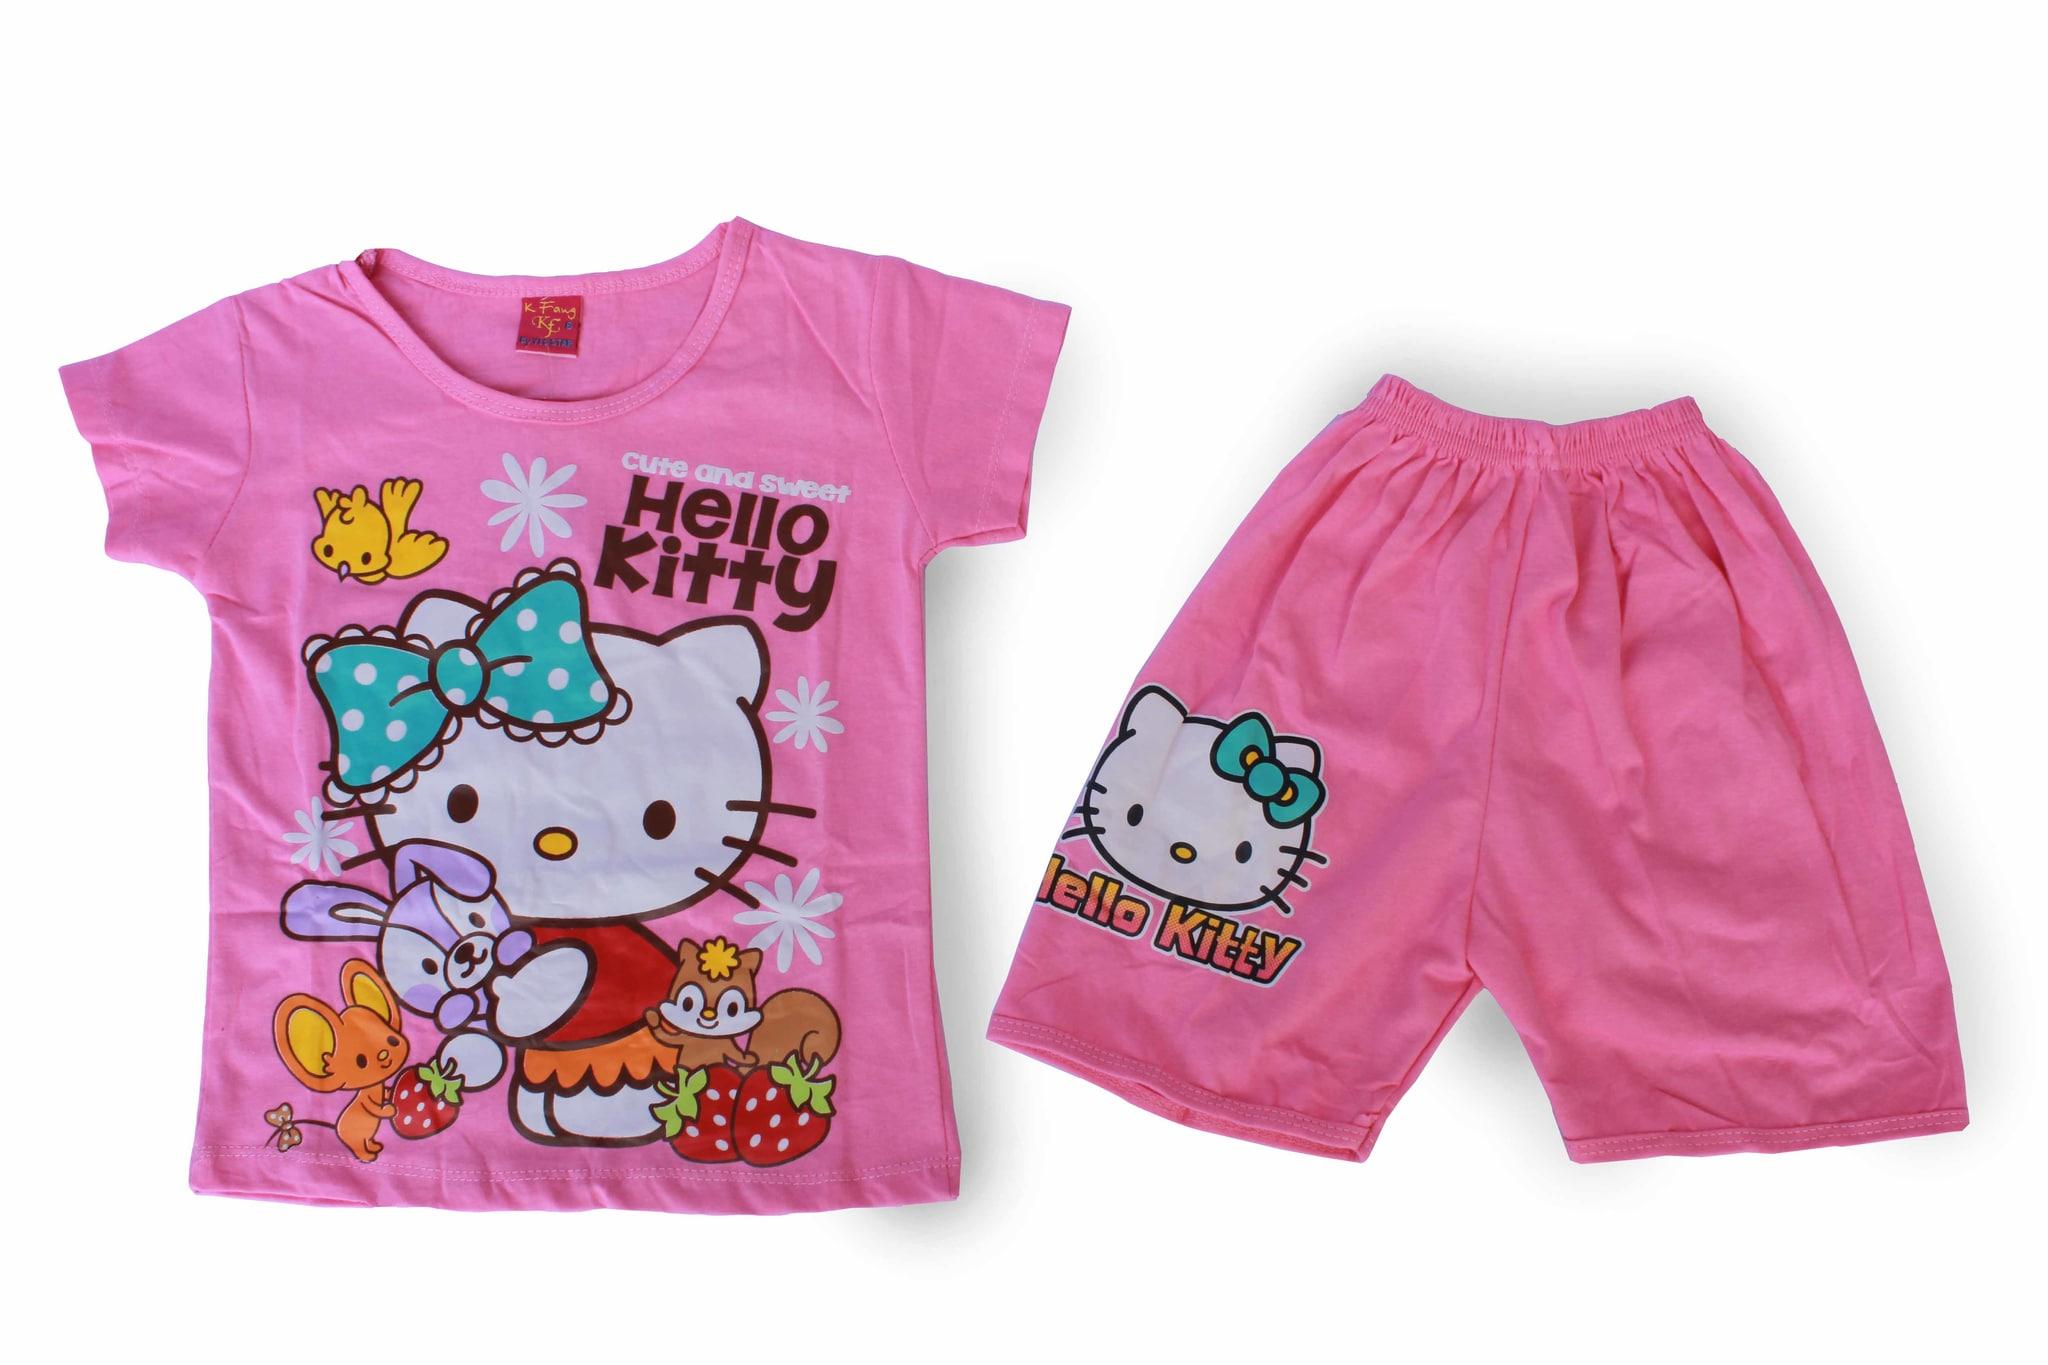 Baju Setelan Anak Perempuan Murah - Hello Kitty SAC -A